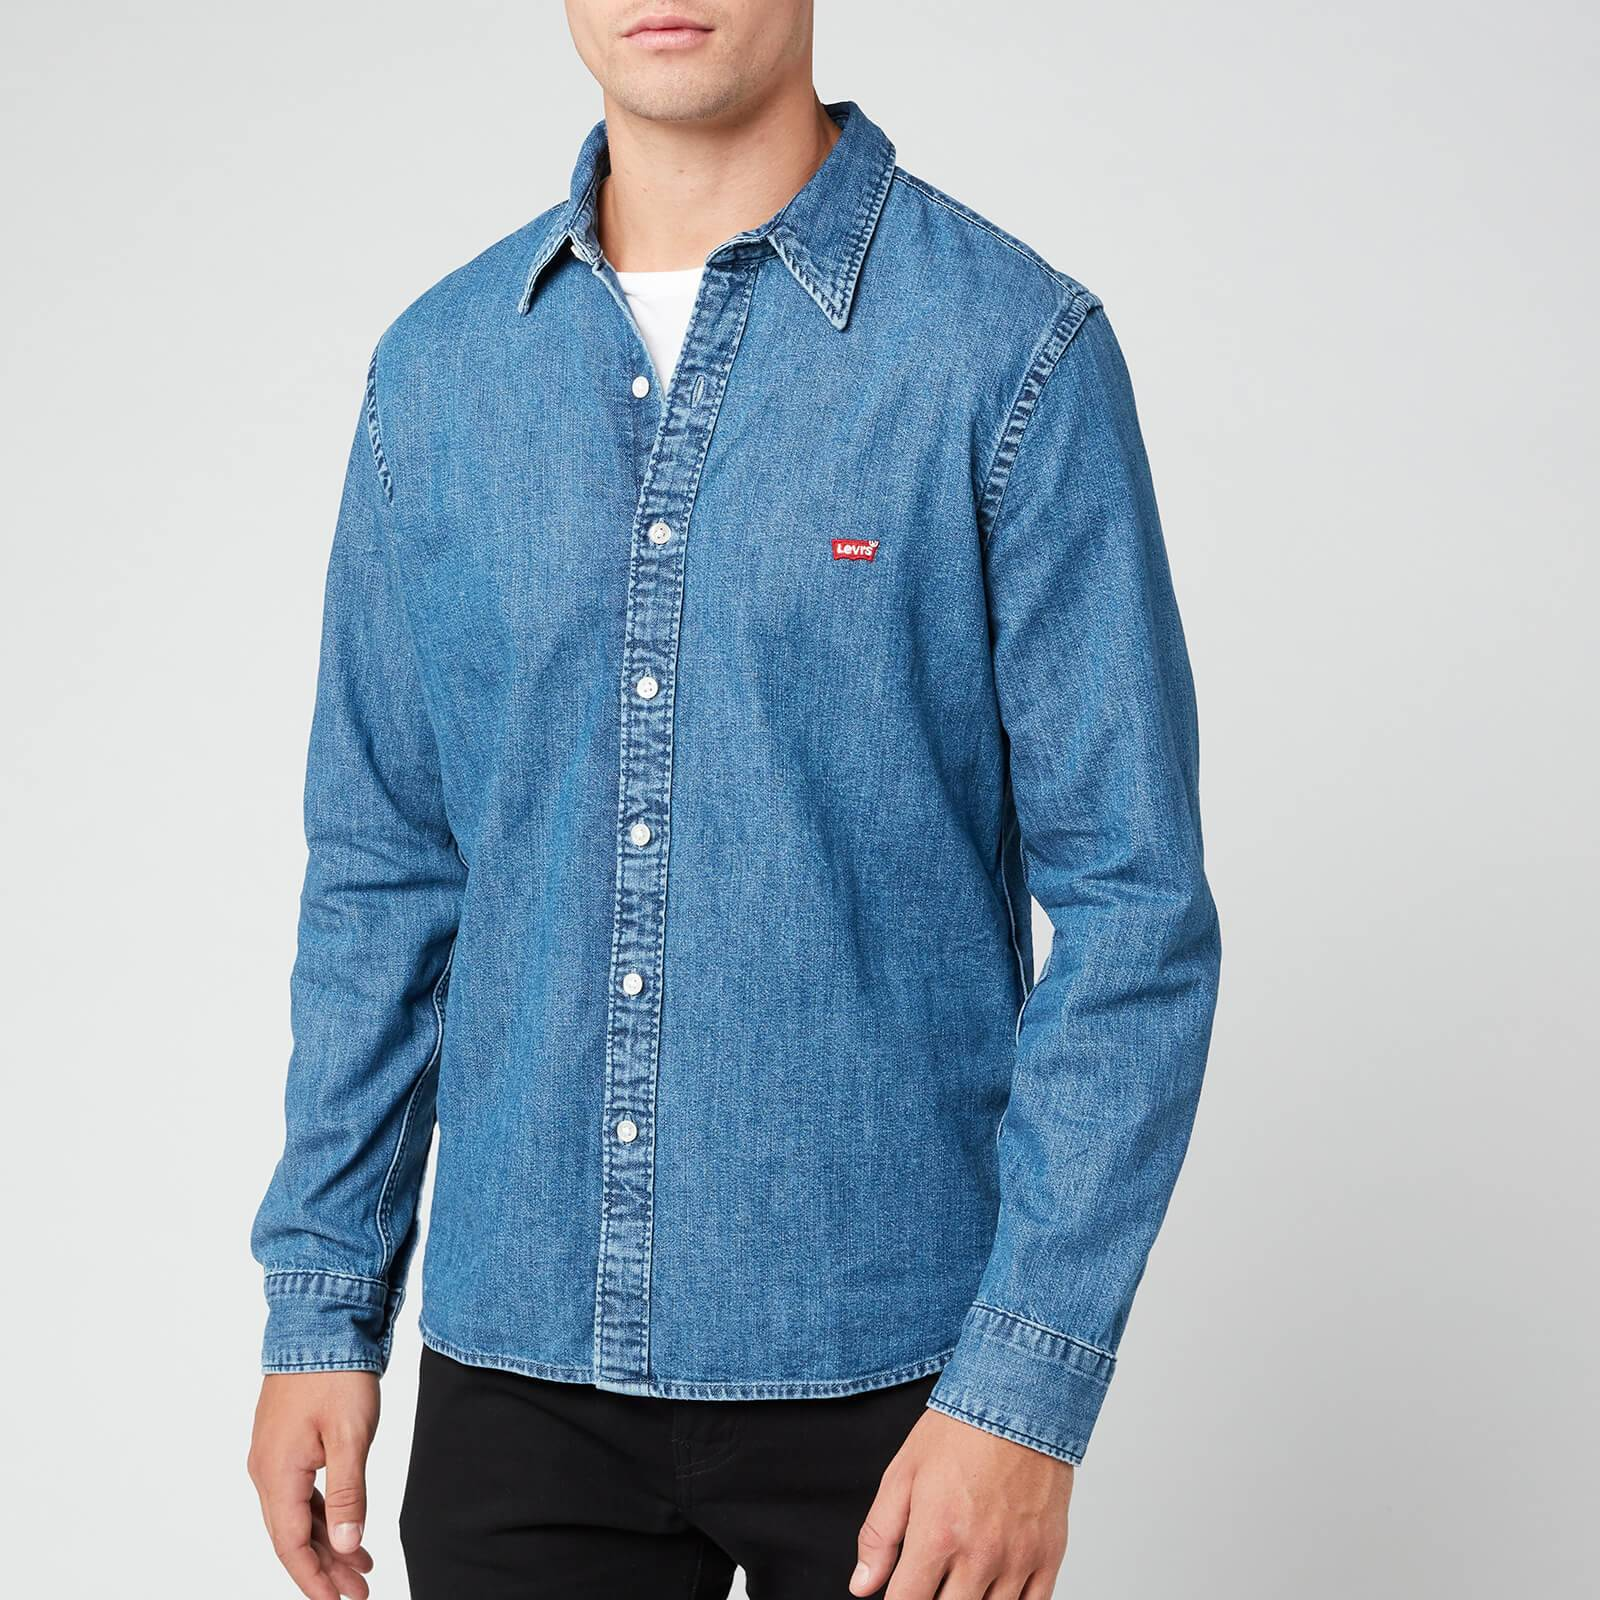 Levi's s Battery Housemark Denim Shirt - Redcast Stone - XXL